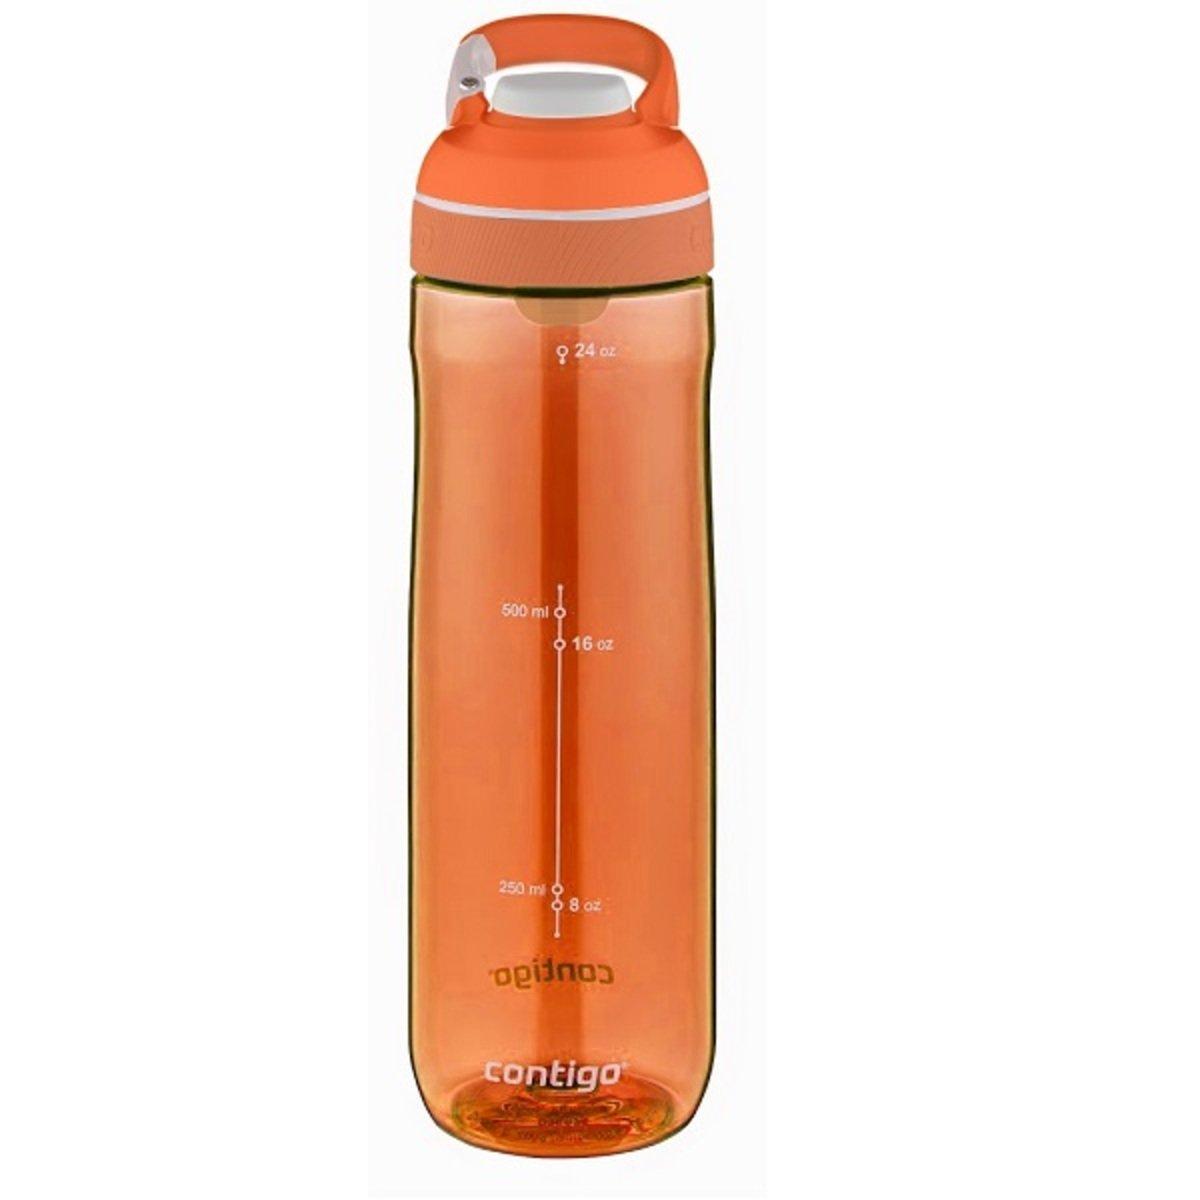 Cortland 運動偷閒杯 - 橙色杯橙色蓋